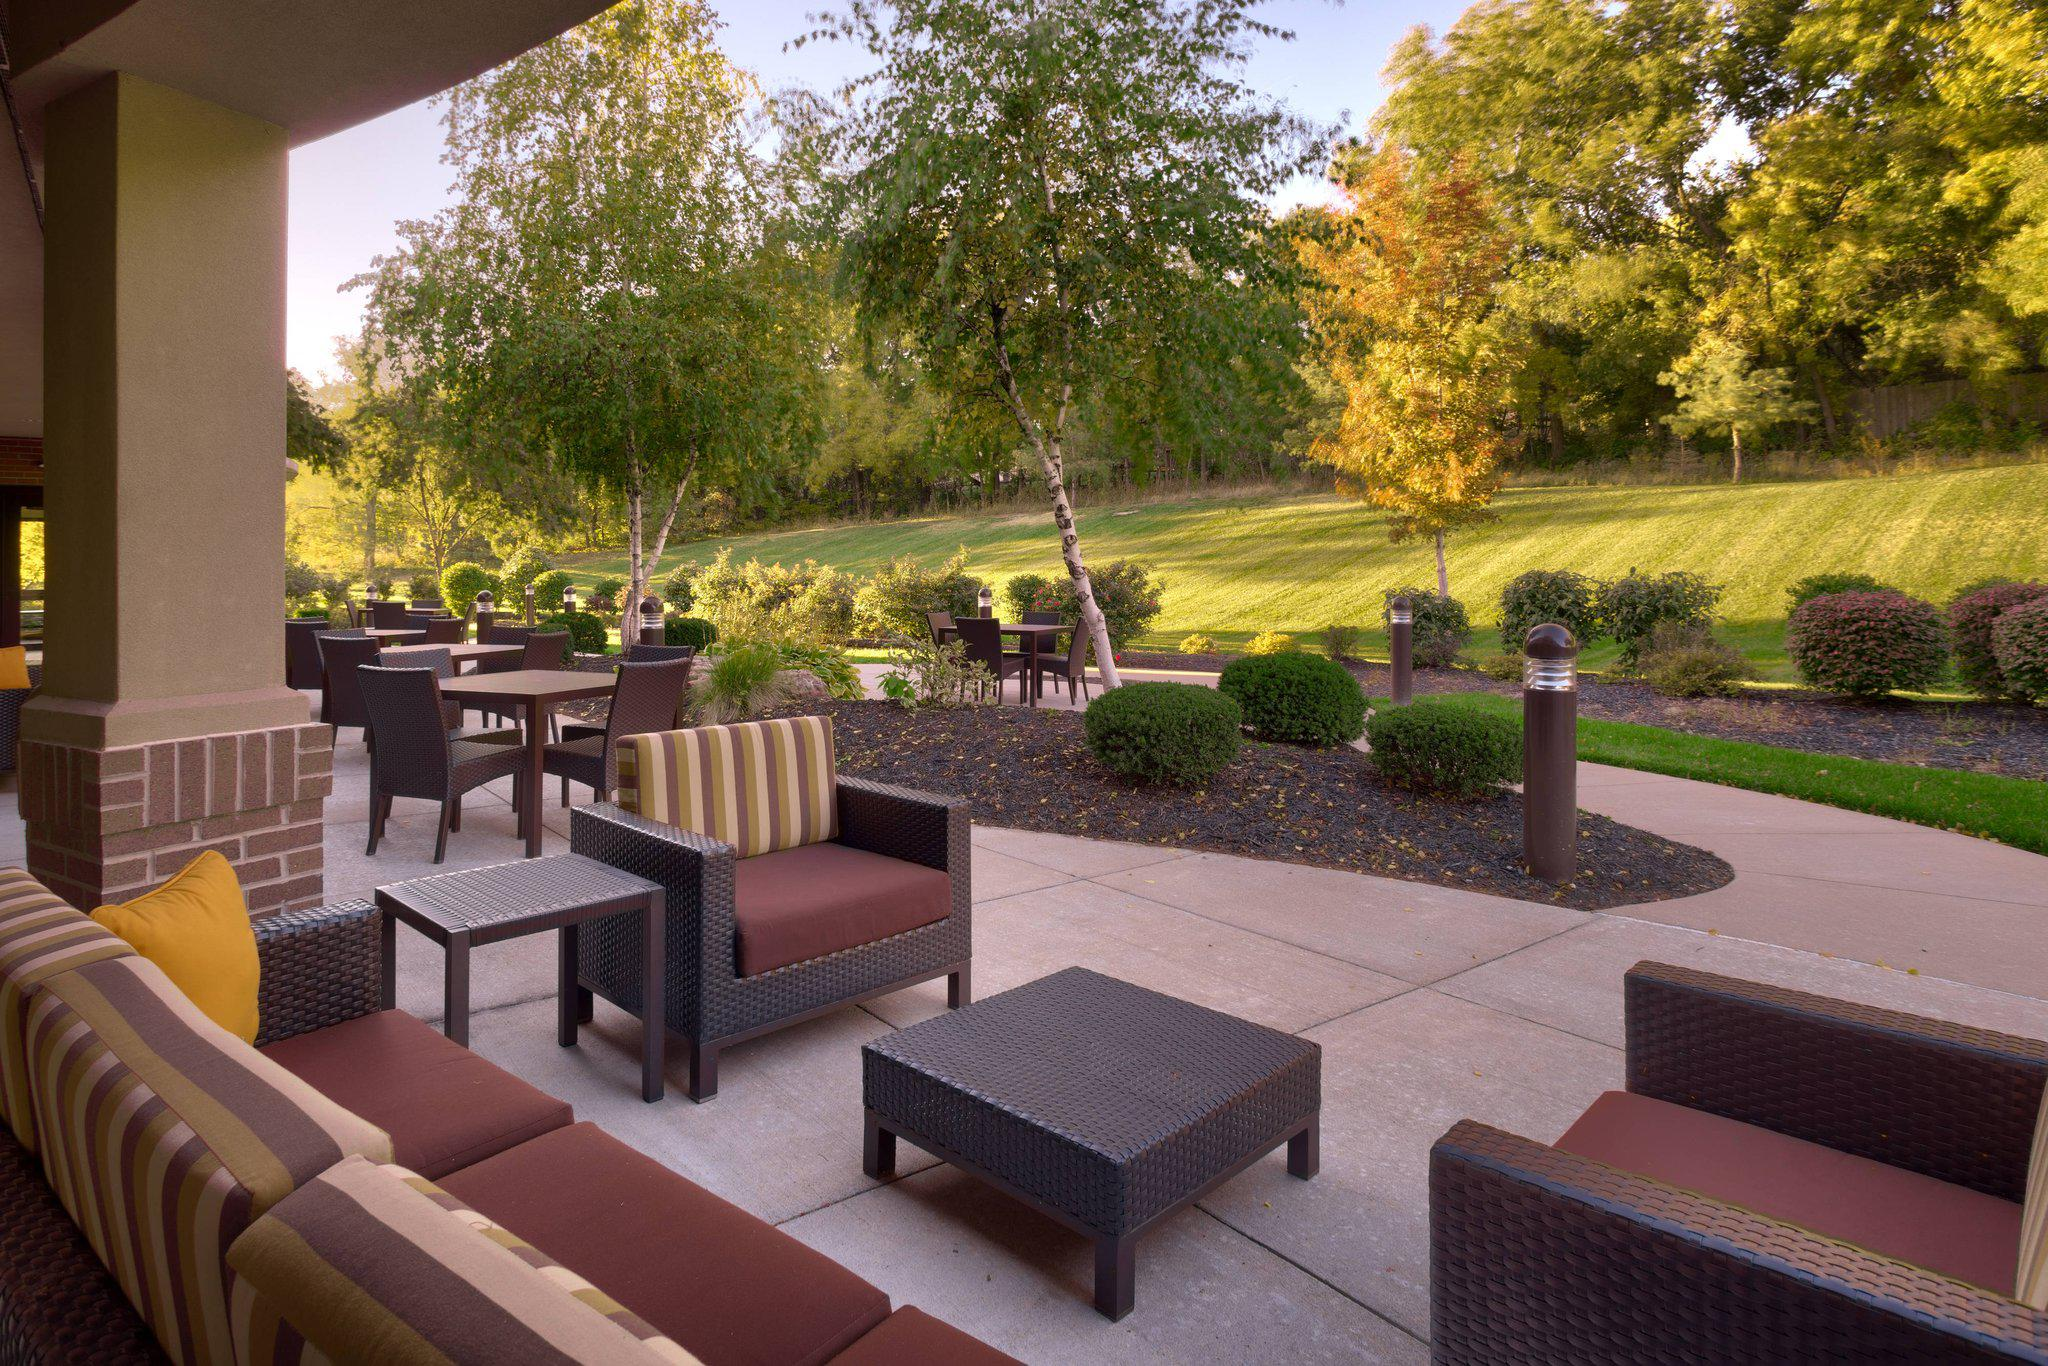 Courtyard by Marriott Kansas City Shawnee